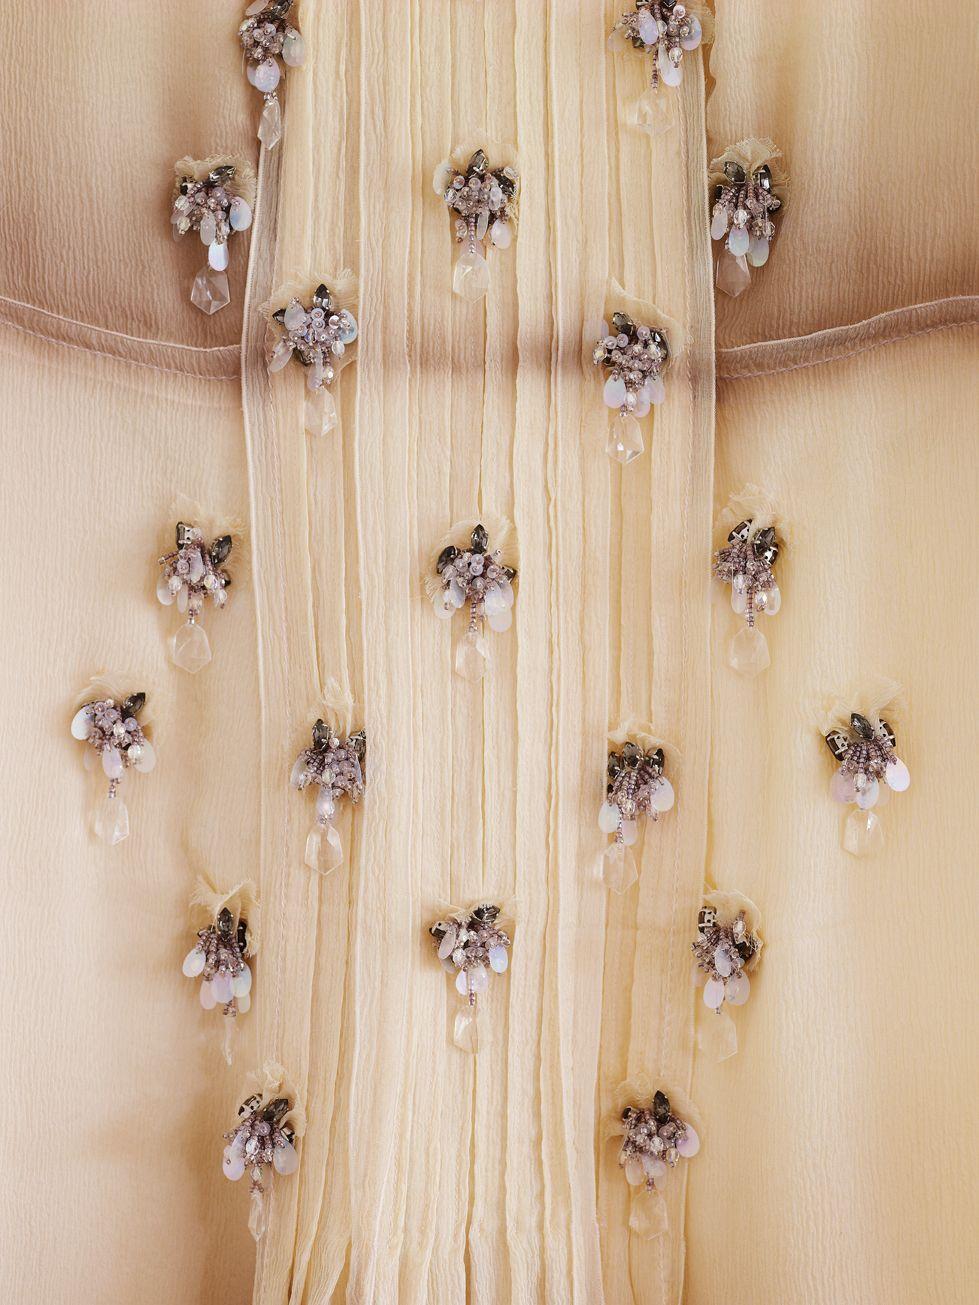 Piet Boon Styling by Karin Meyn | Beautiful dress details, inspiration.